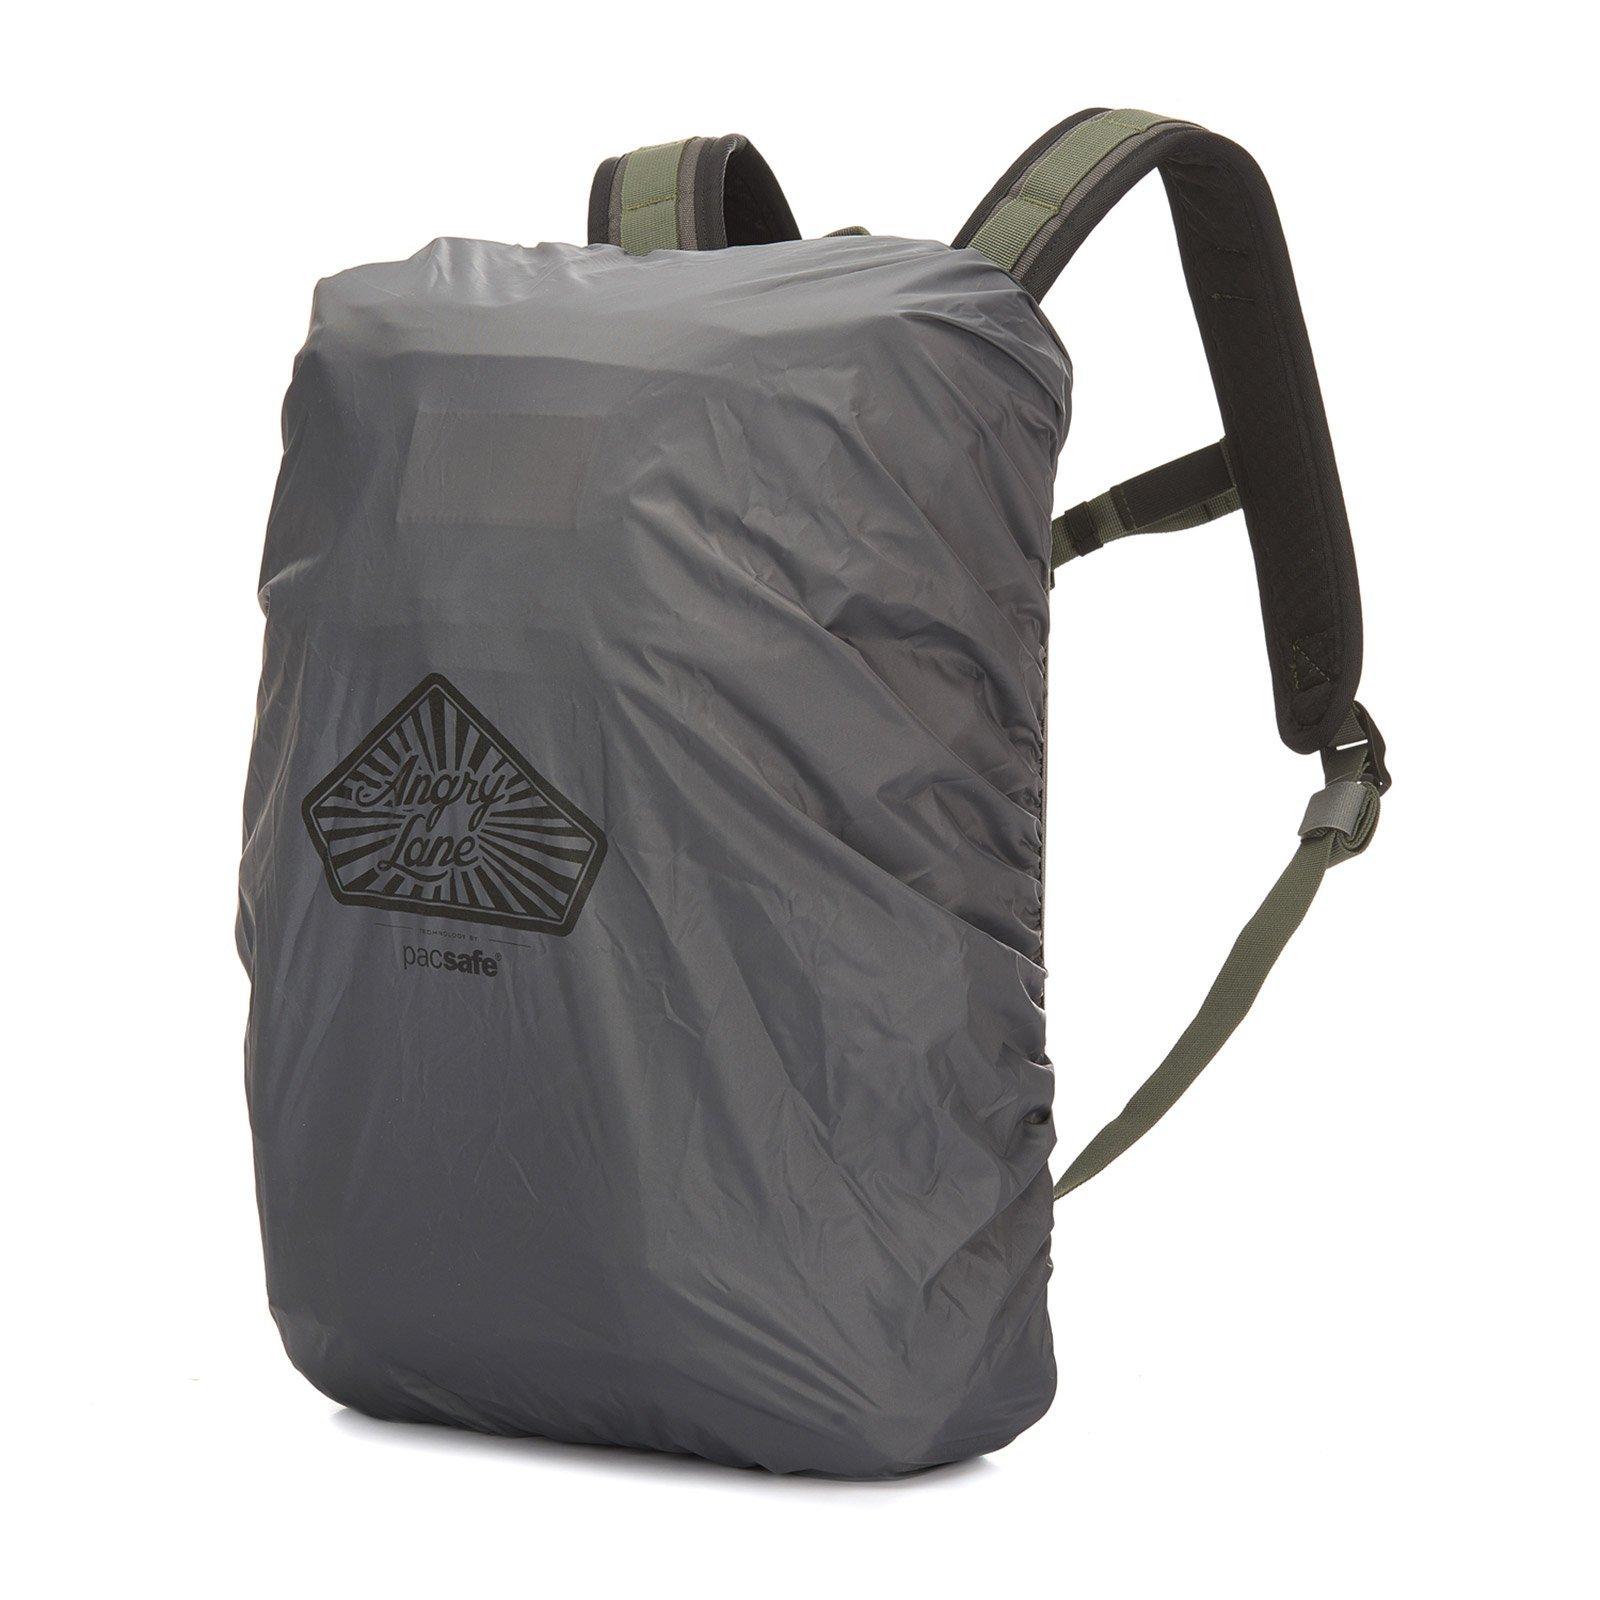 Daypack